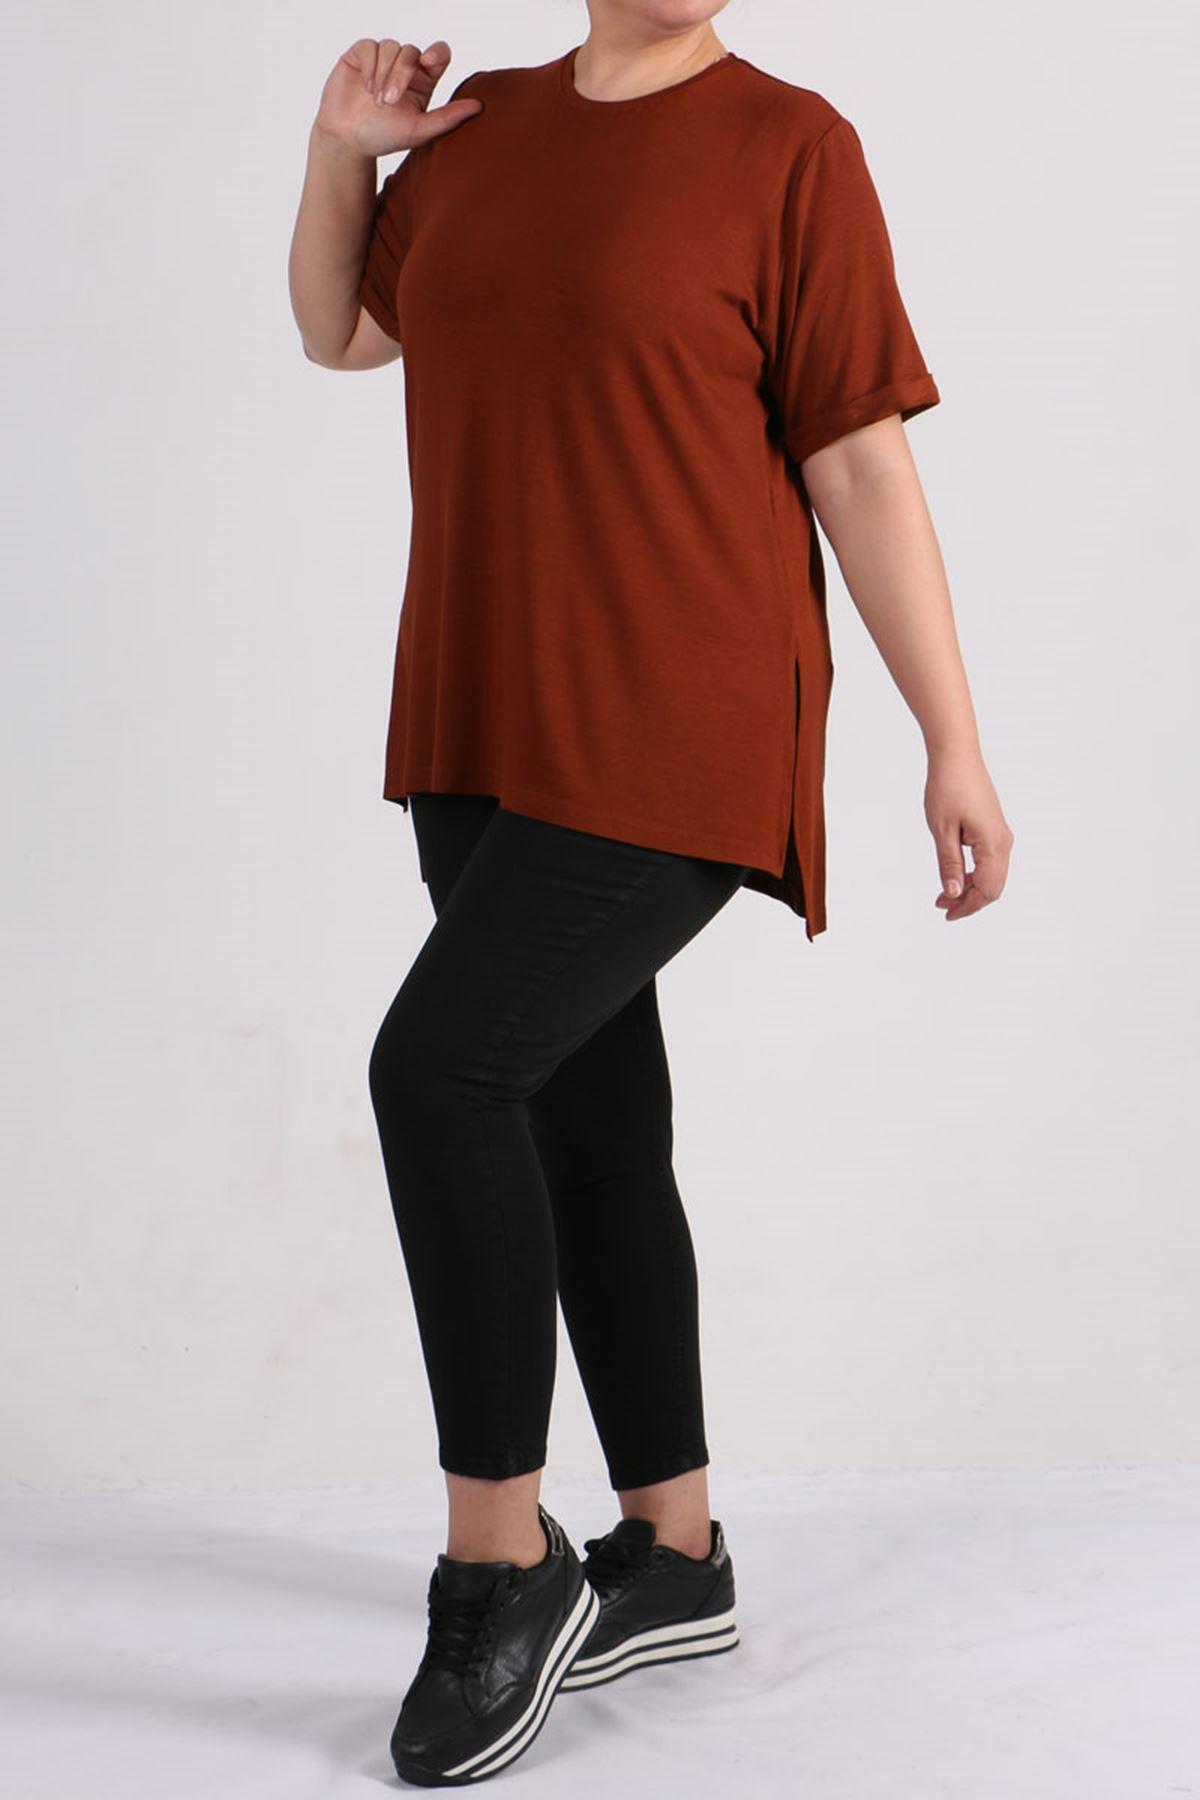 8529 Plus Size Basic T-shirt - Terra Cotta